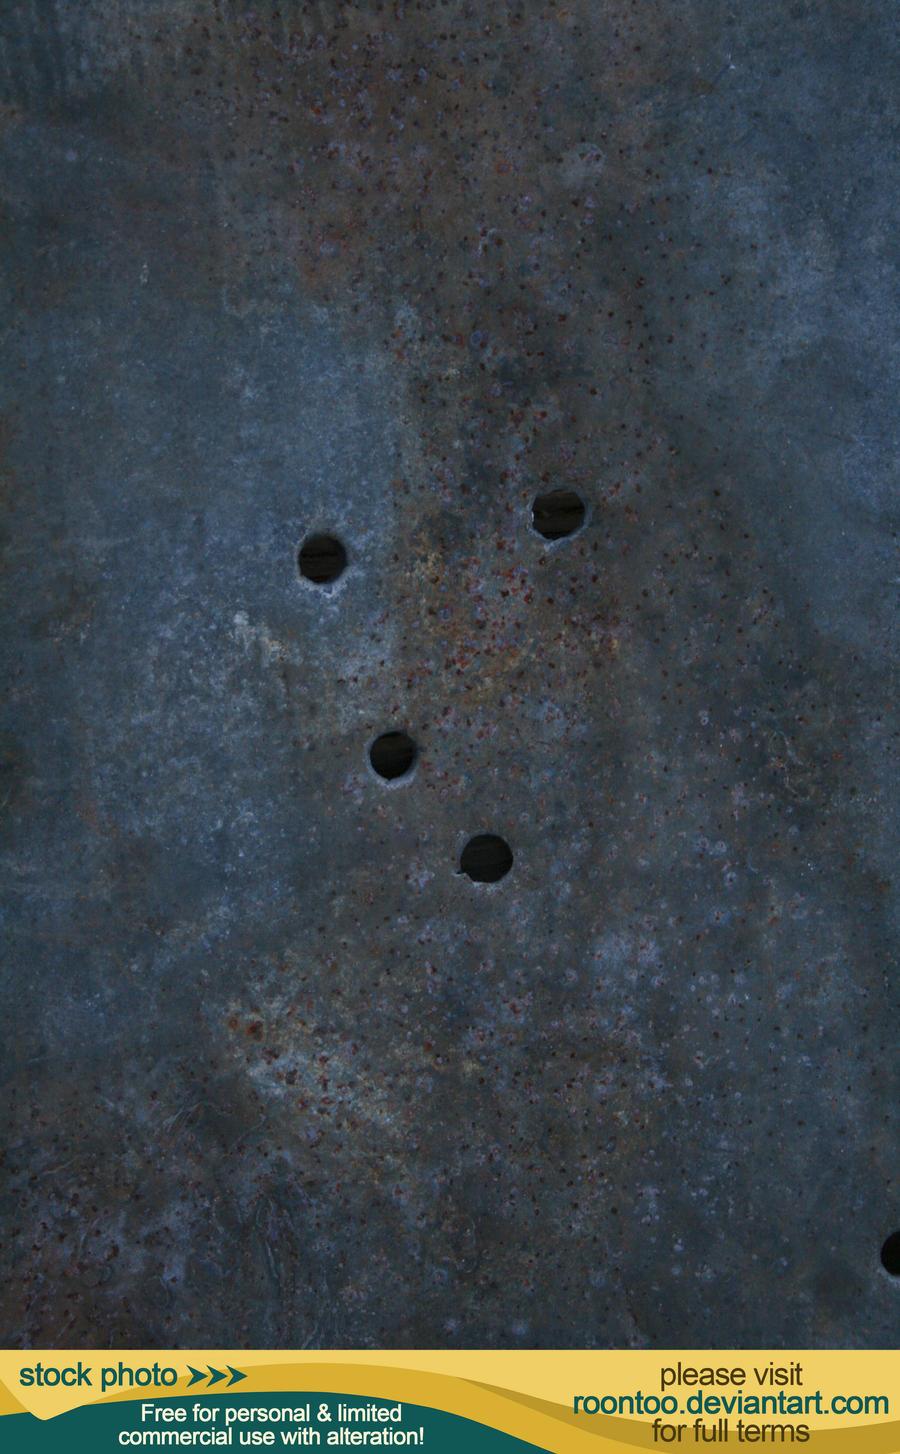 Rusty metal 17 by RoonToo